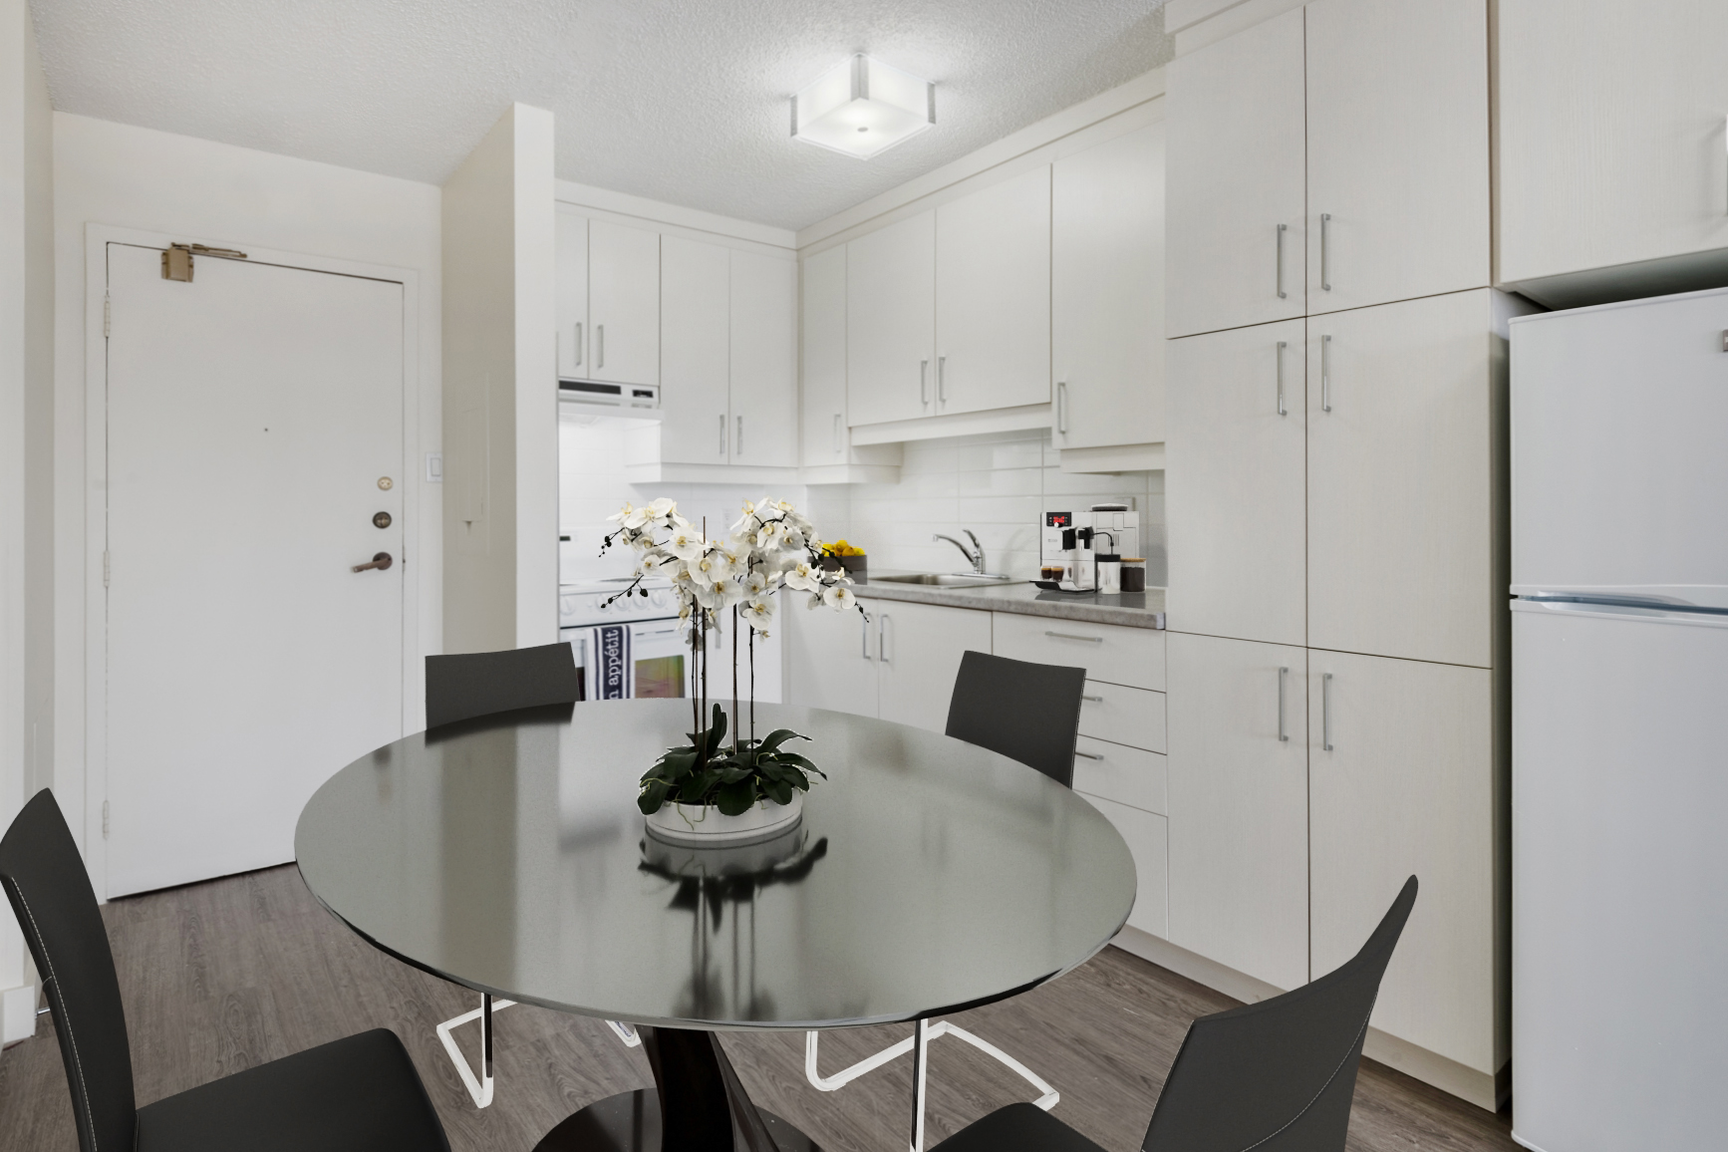 1 bedroom Apartments for rent in Laval at Le Quatre Cent - Photo 12 - RentersPages – L407184